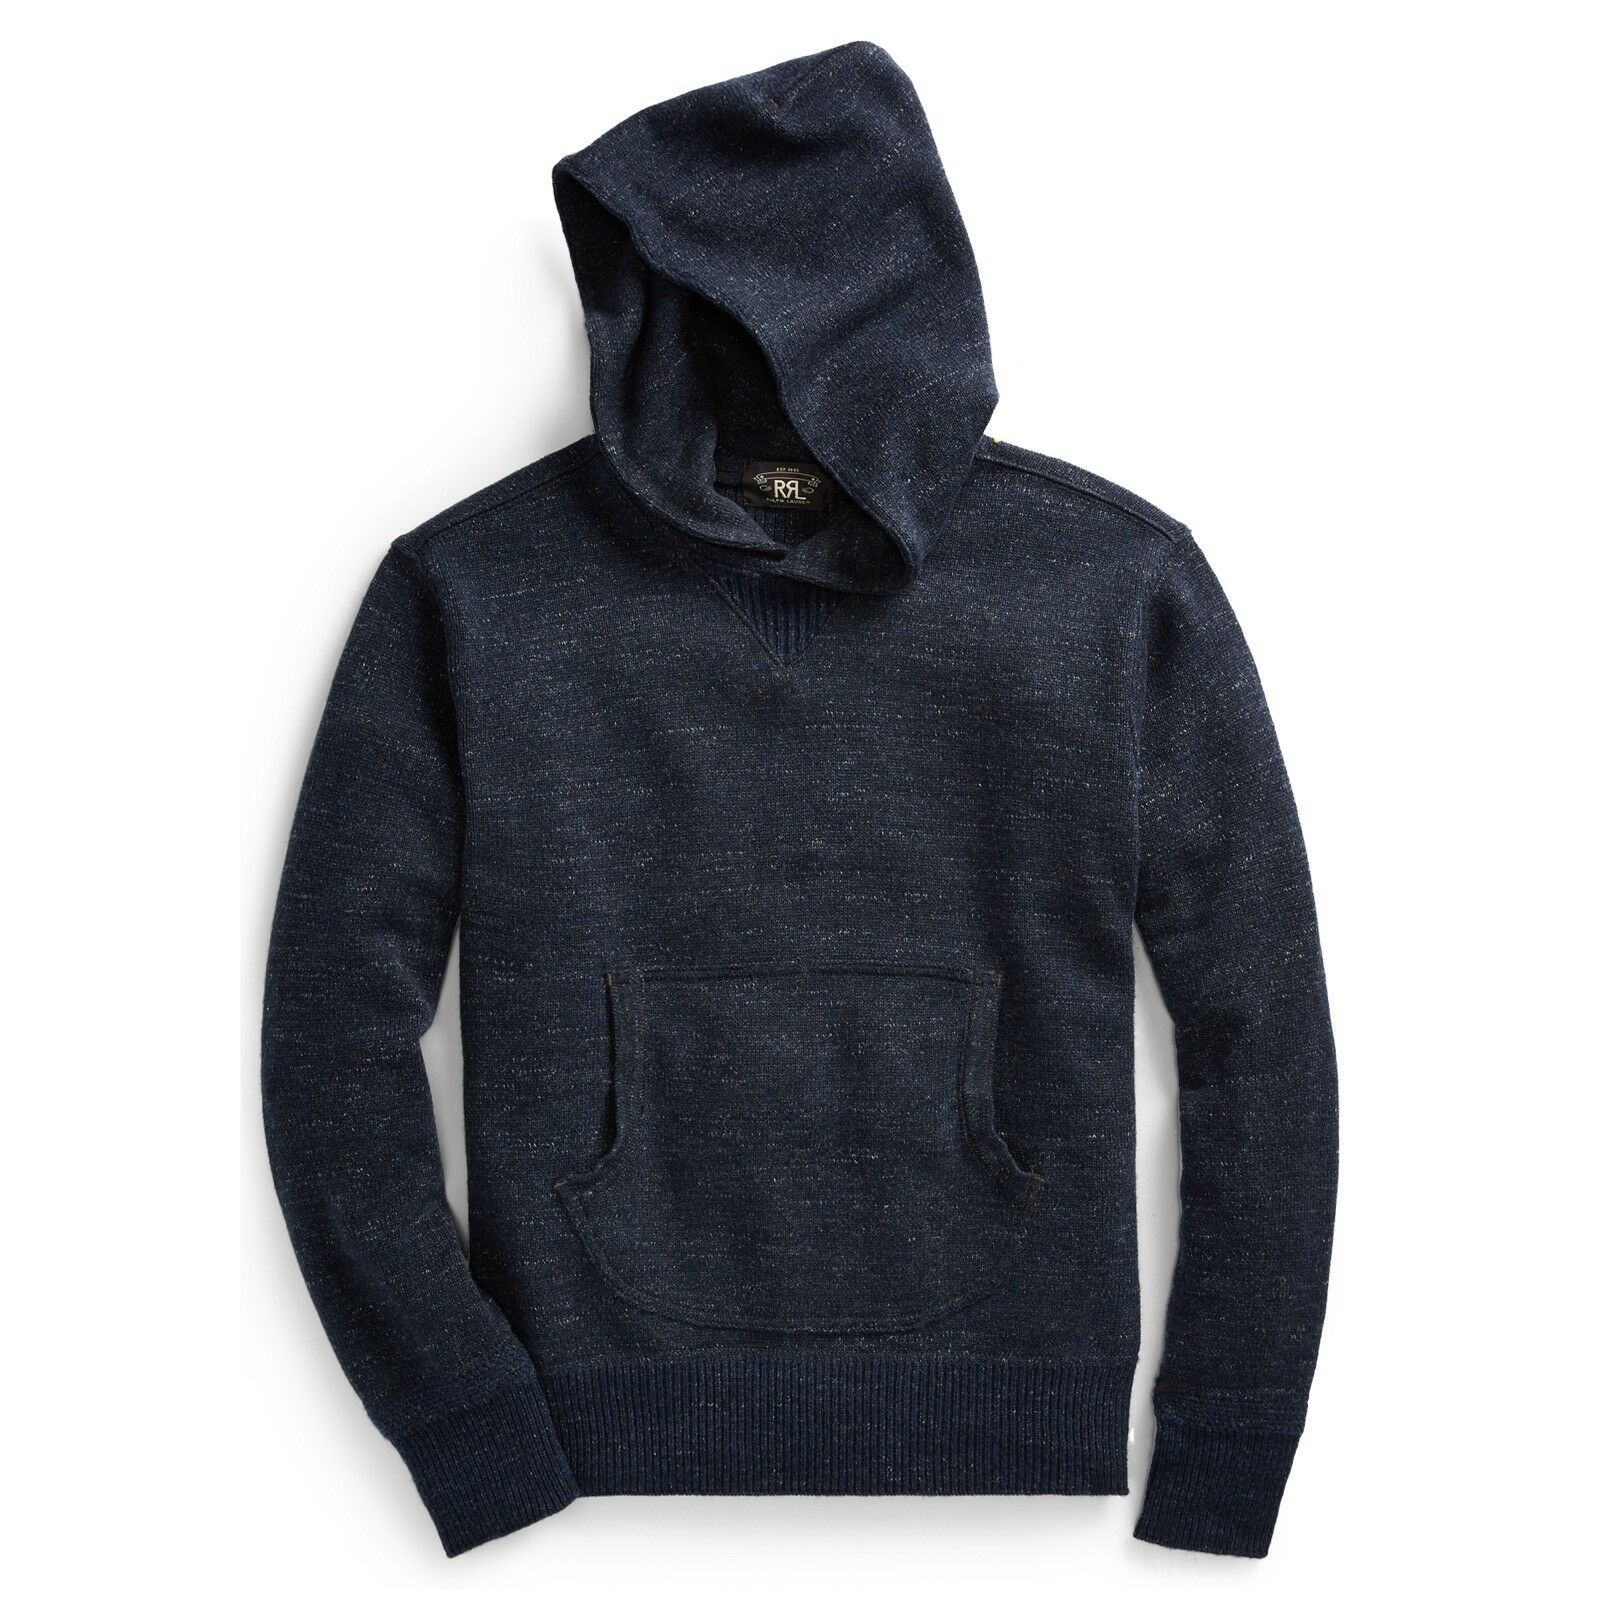 695 RRL Ralph Lauren 1930s InspiROT Made in USA Wool Cotton Sweater Hoodie- S